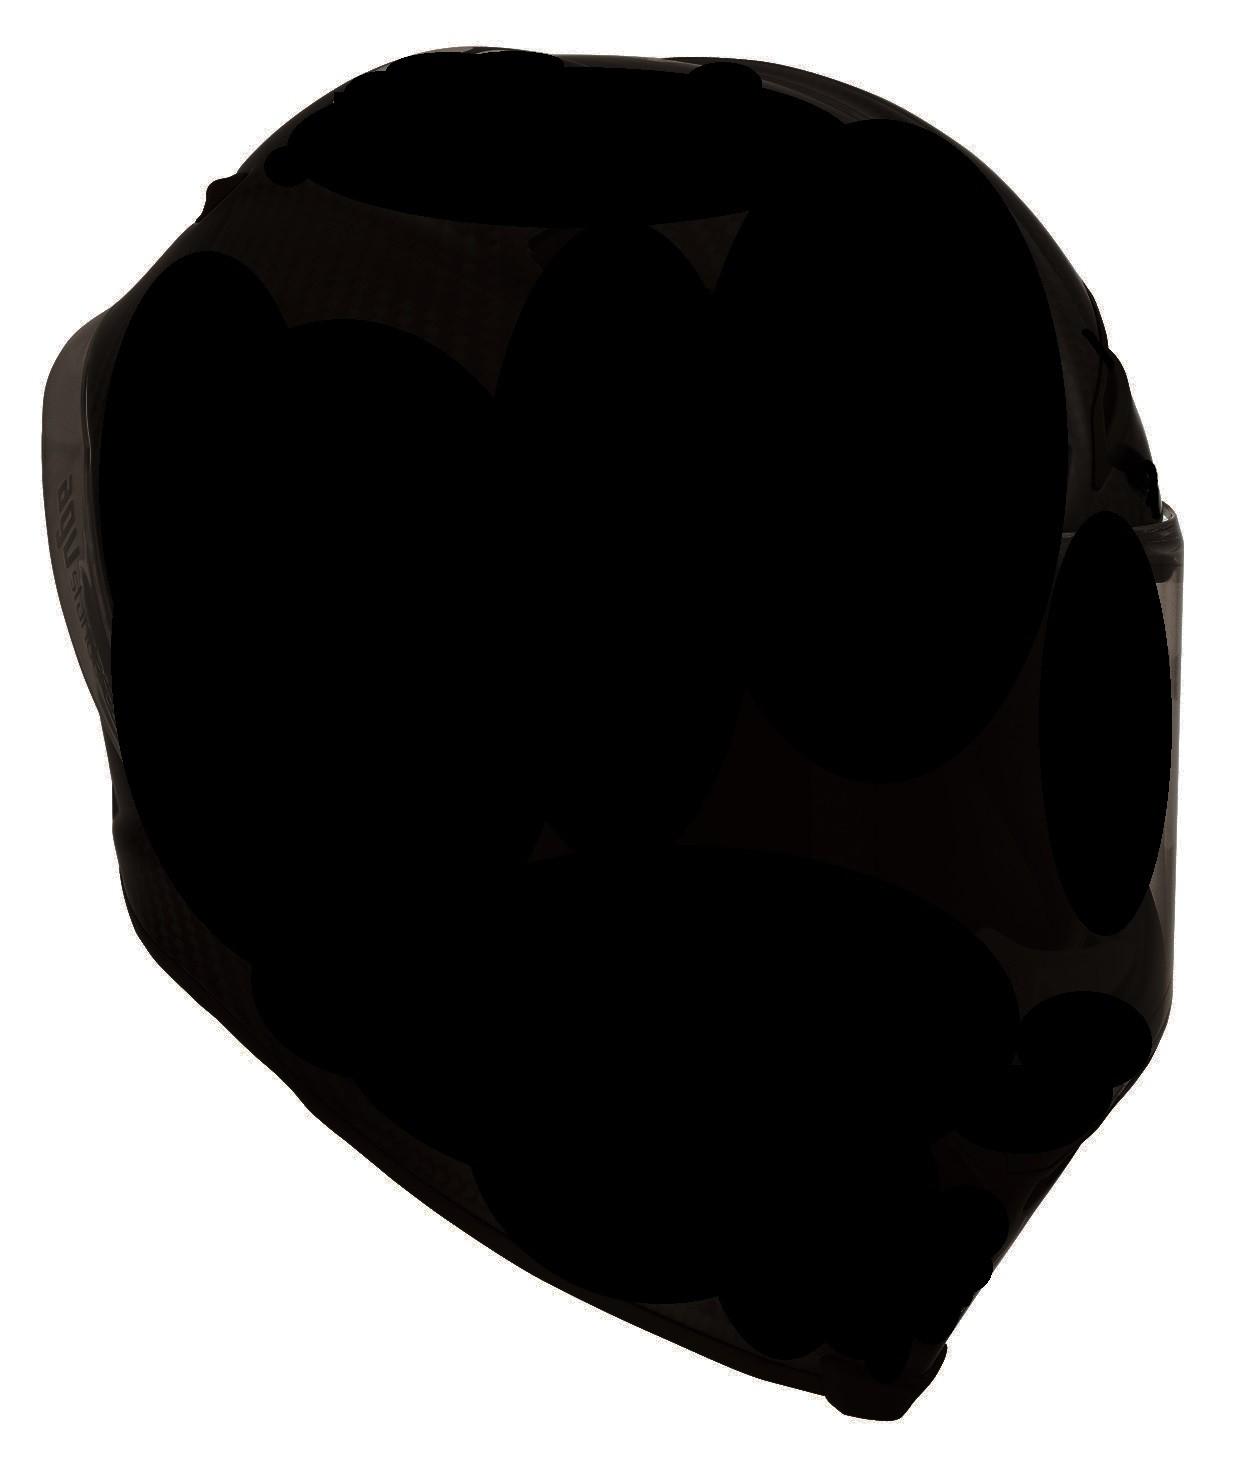 AGV AX-8 Evo Naked Helmet - LSH Racing World